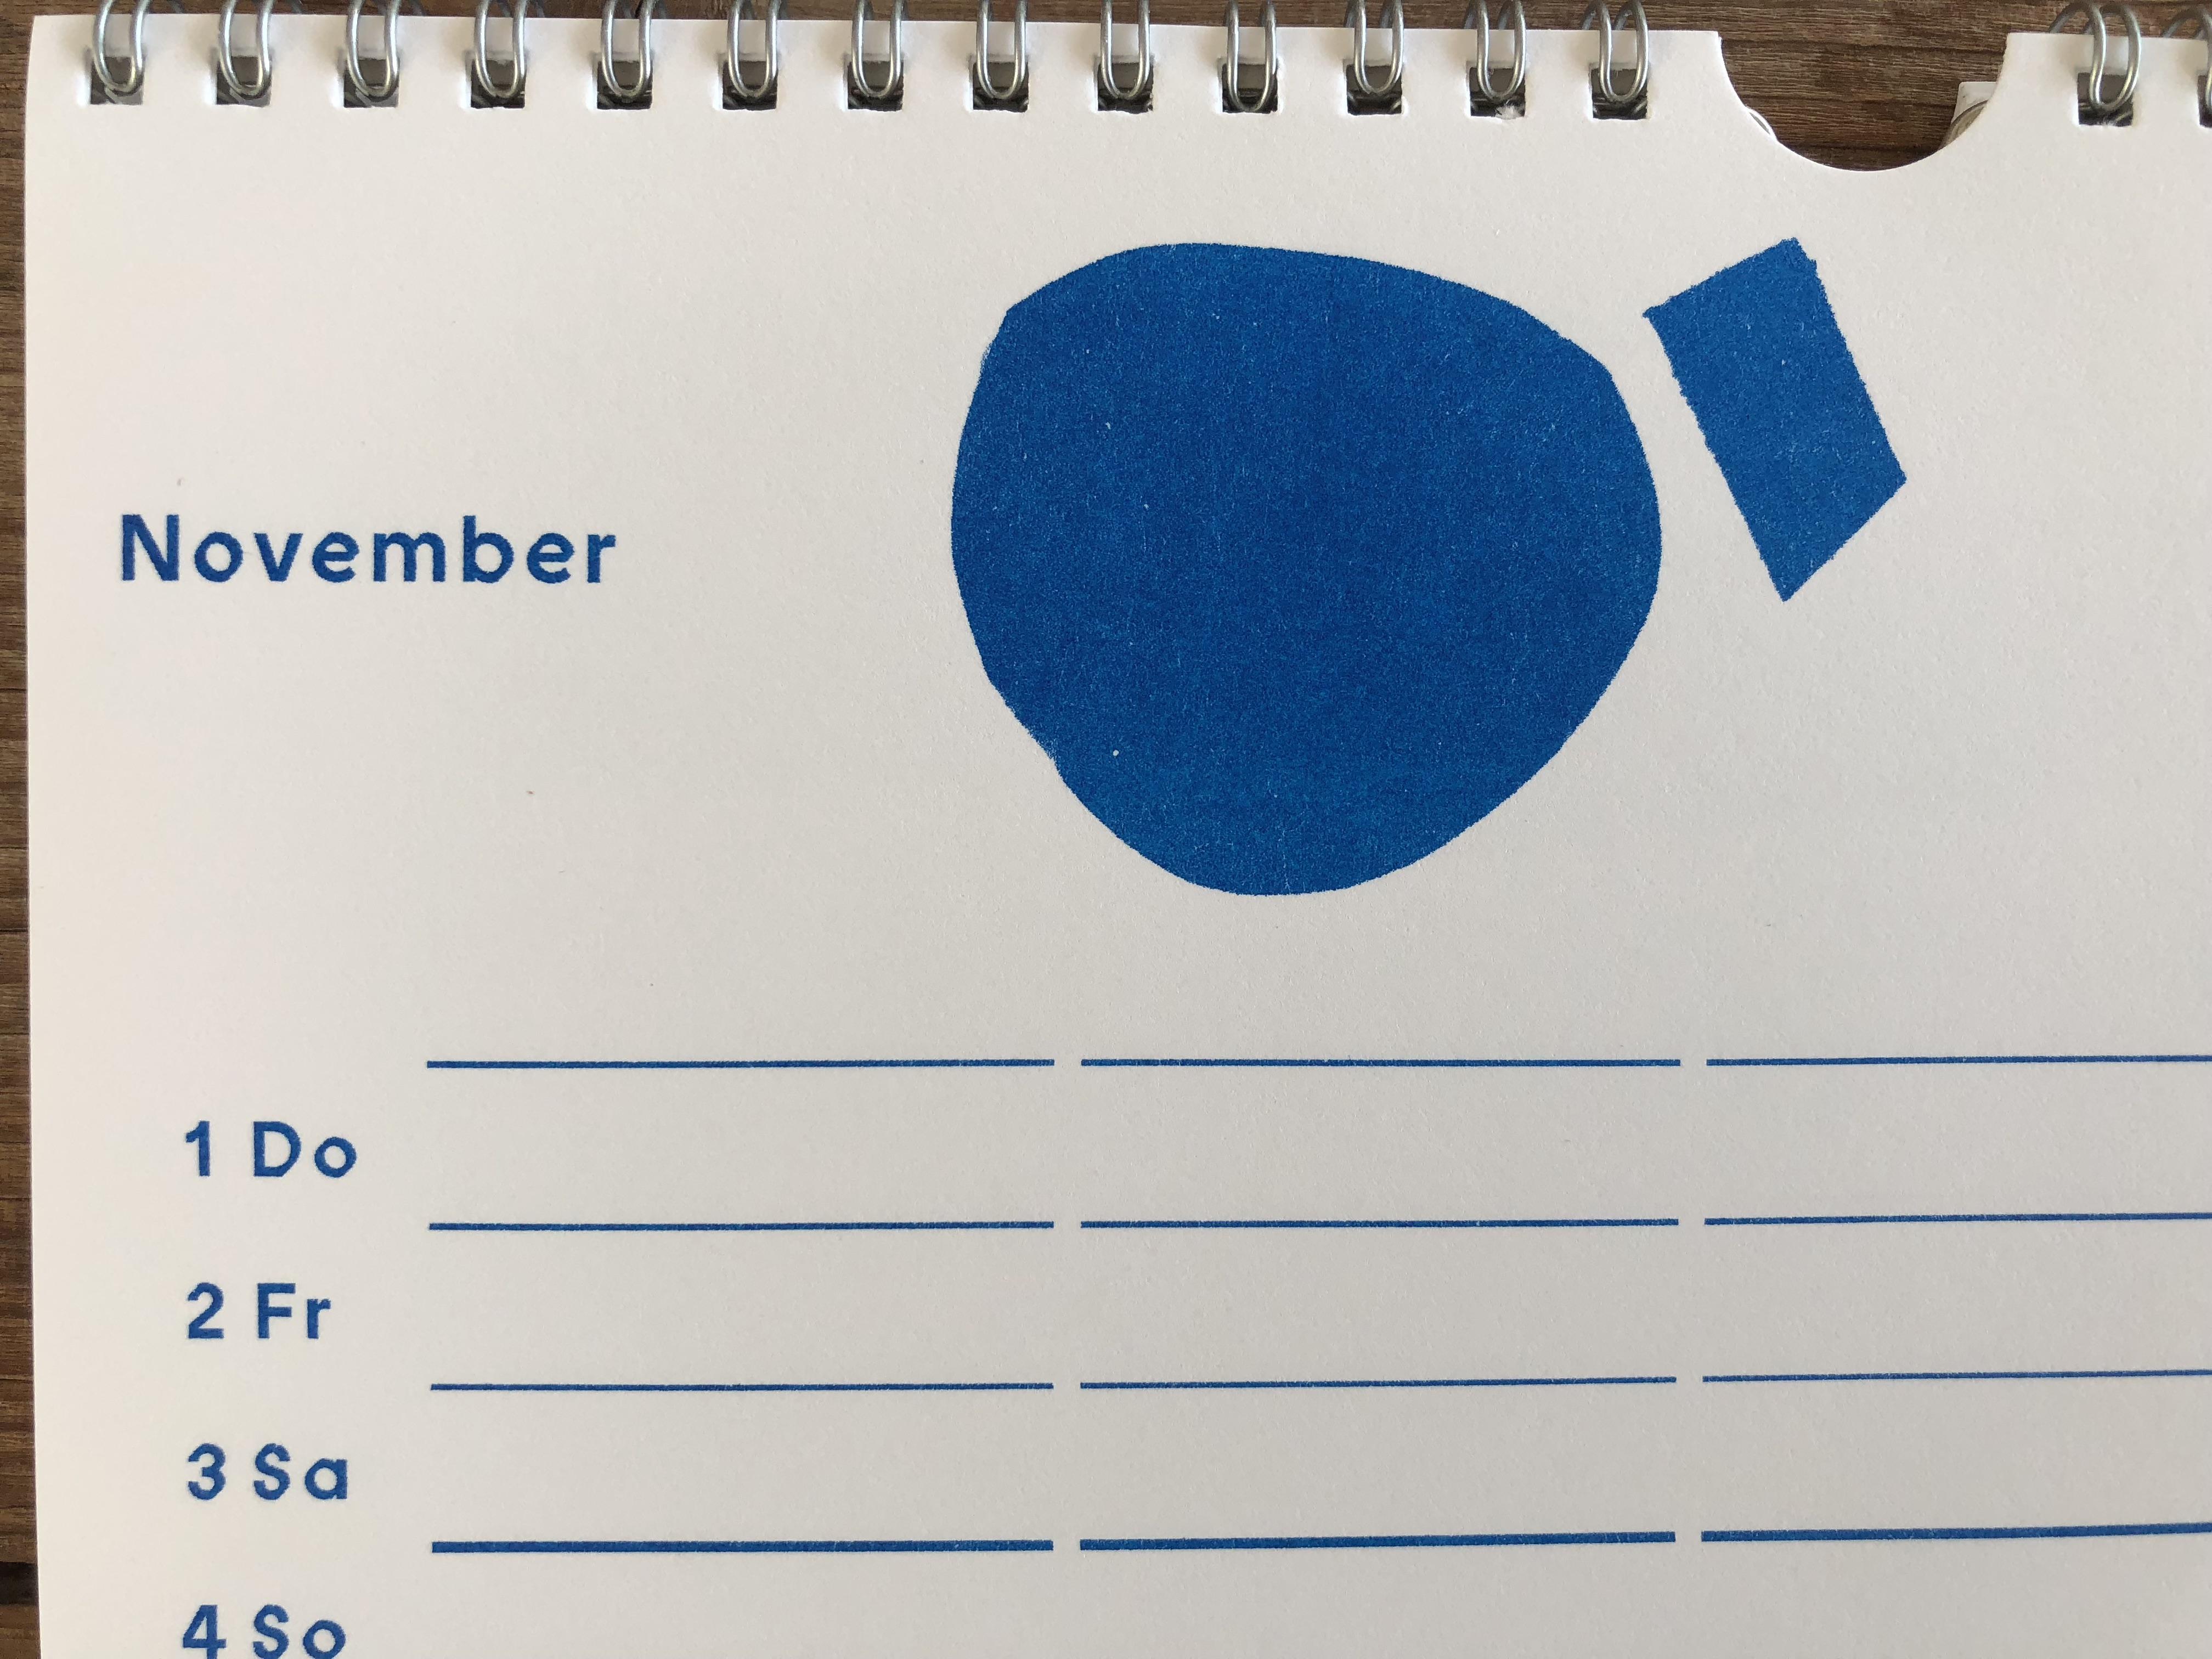 Jahresplaner, Jahreskalender, Agenda, Familienkalender, Familienplaner